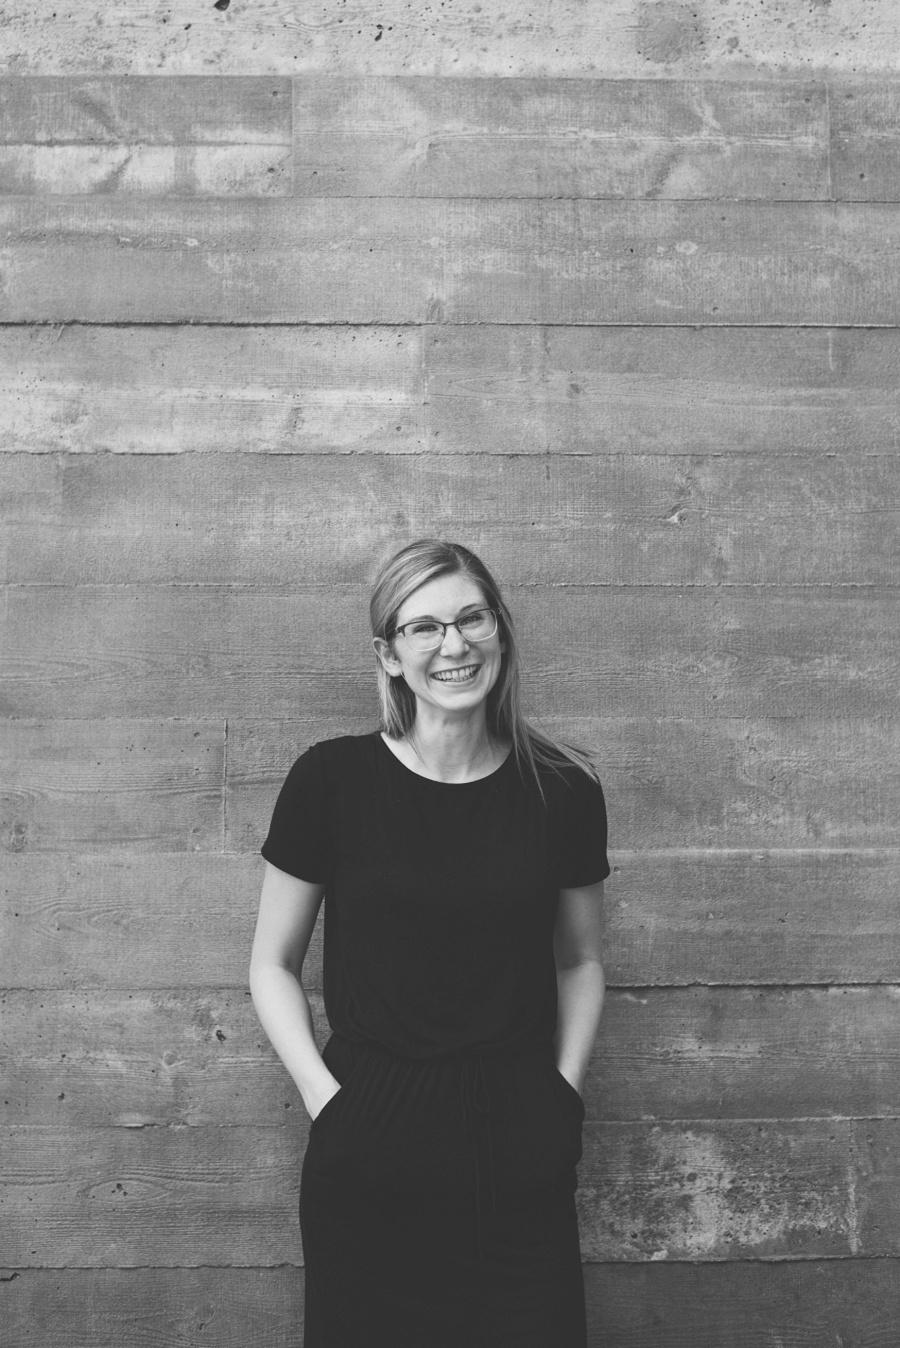 Headshot of Kristine Brevik smiling